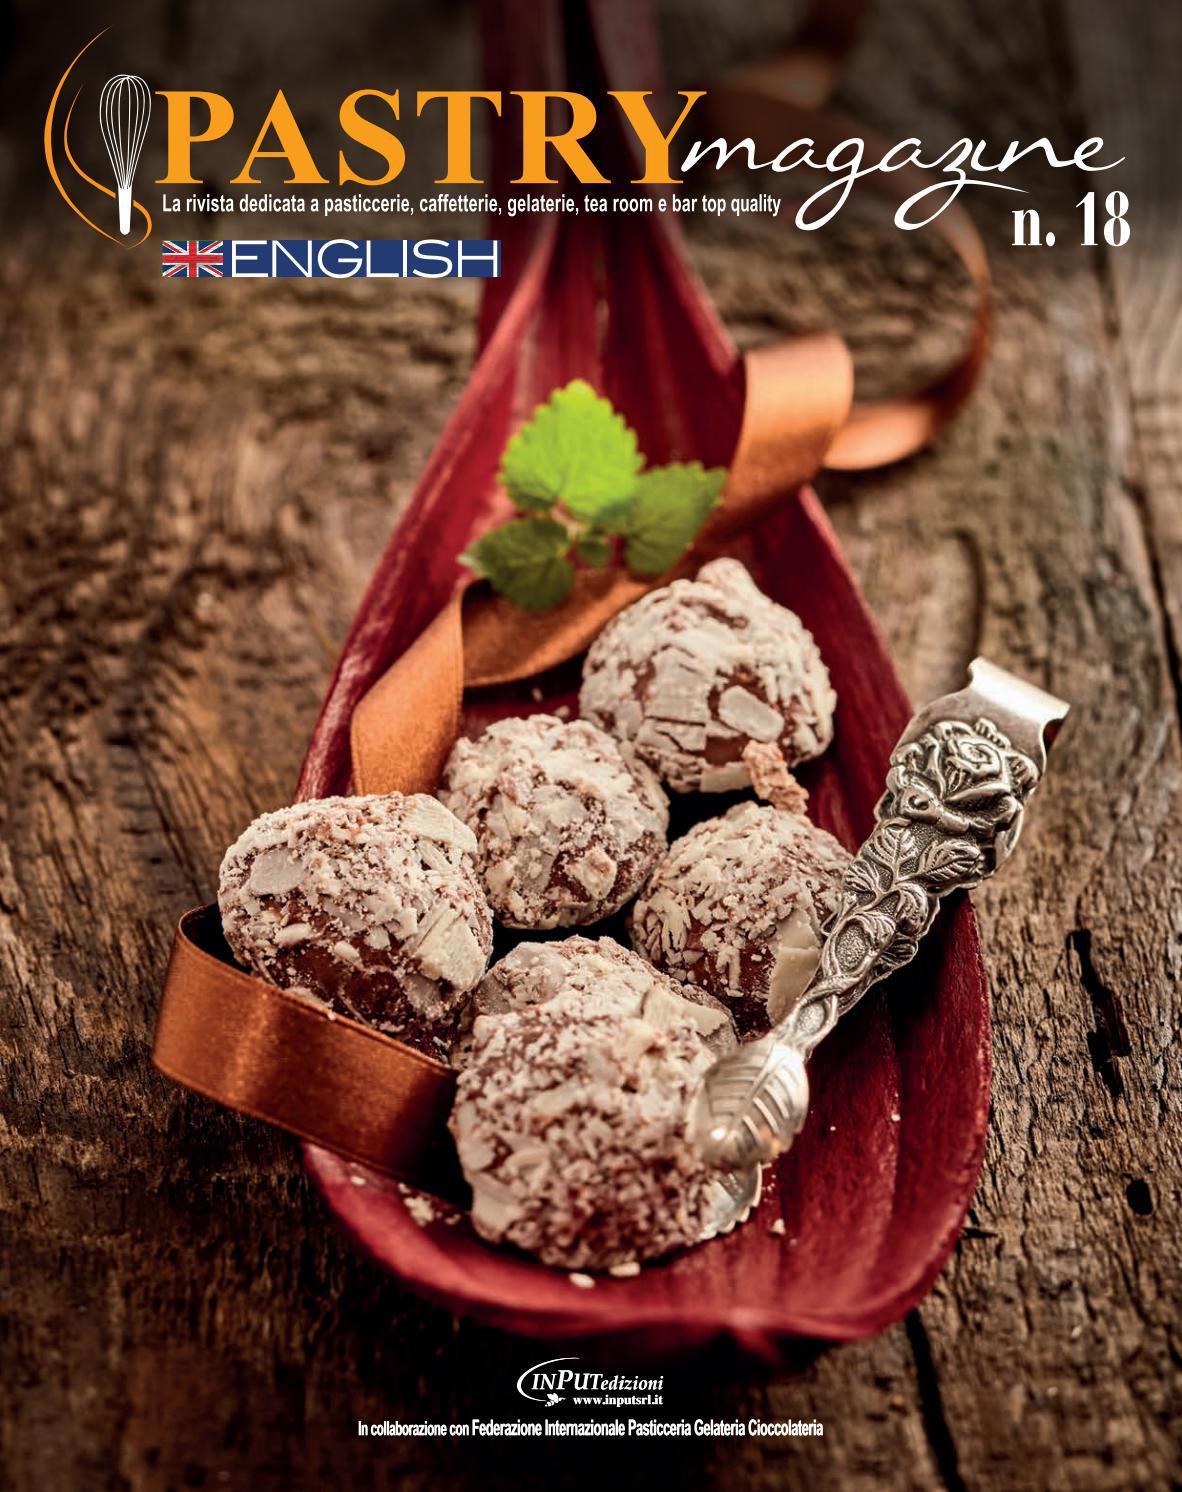 Pastry magazine  №18 English